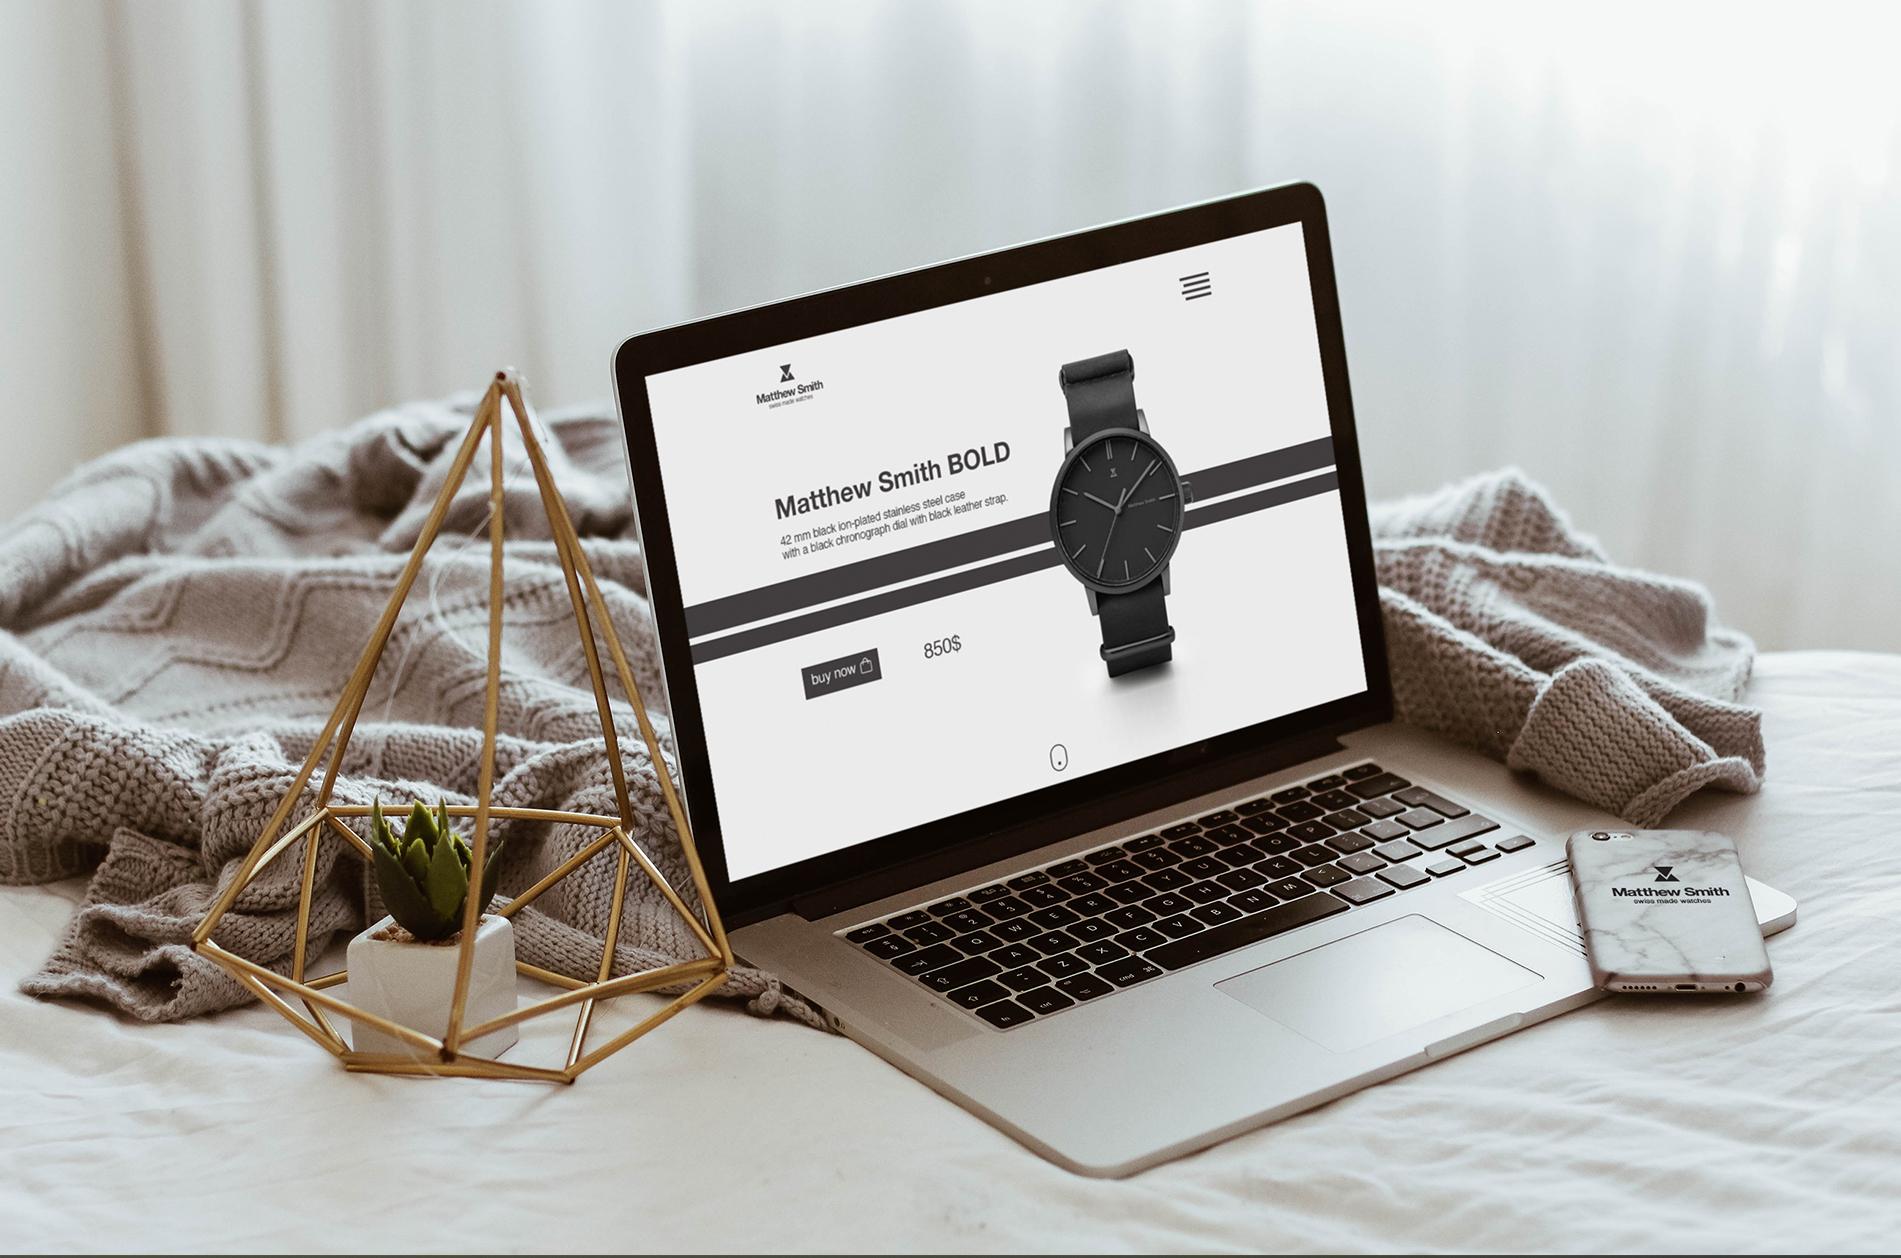 UI/UX Design watch brand https://www.linkedin.com/in/martin-andonov-445148163/